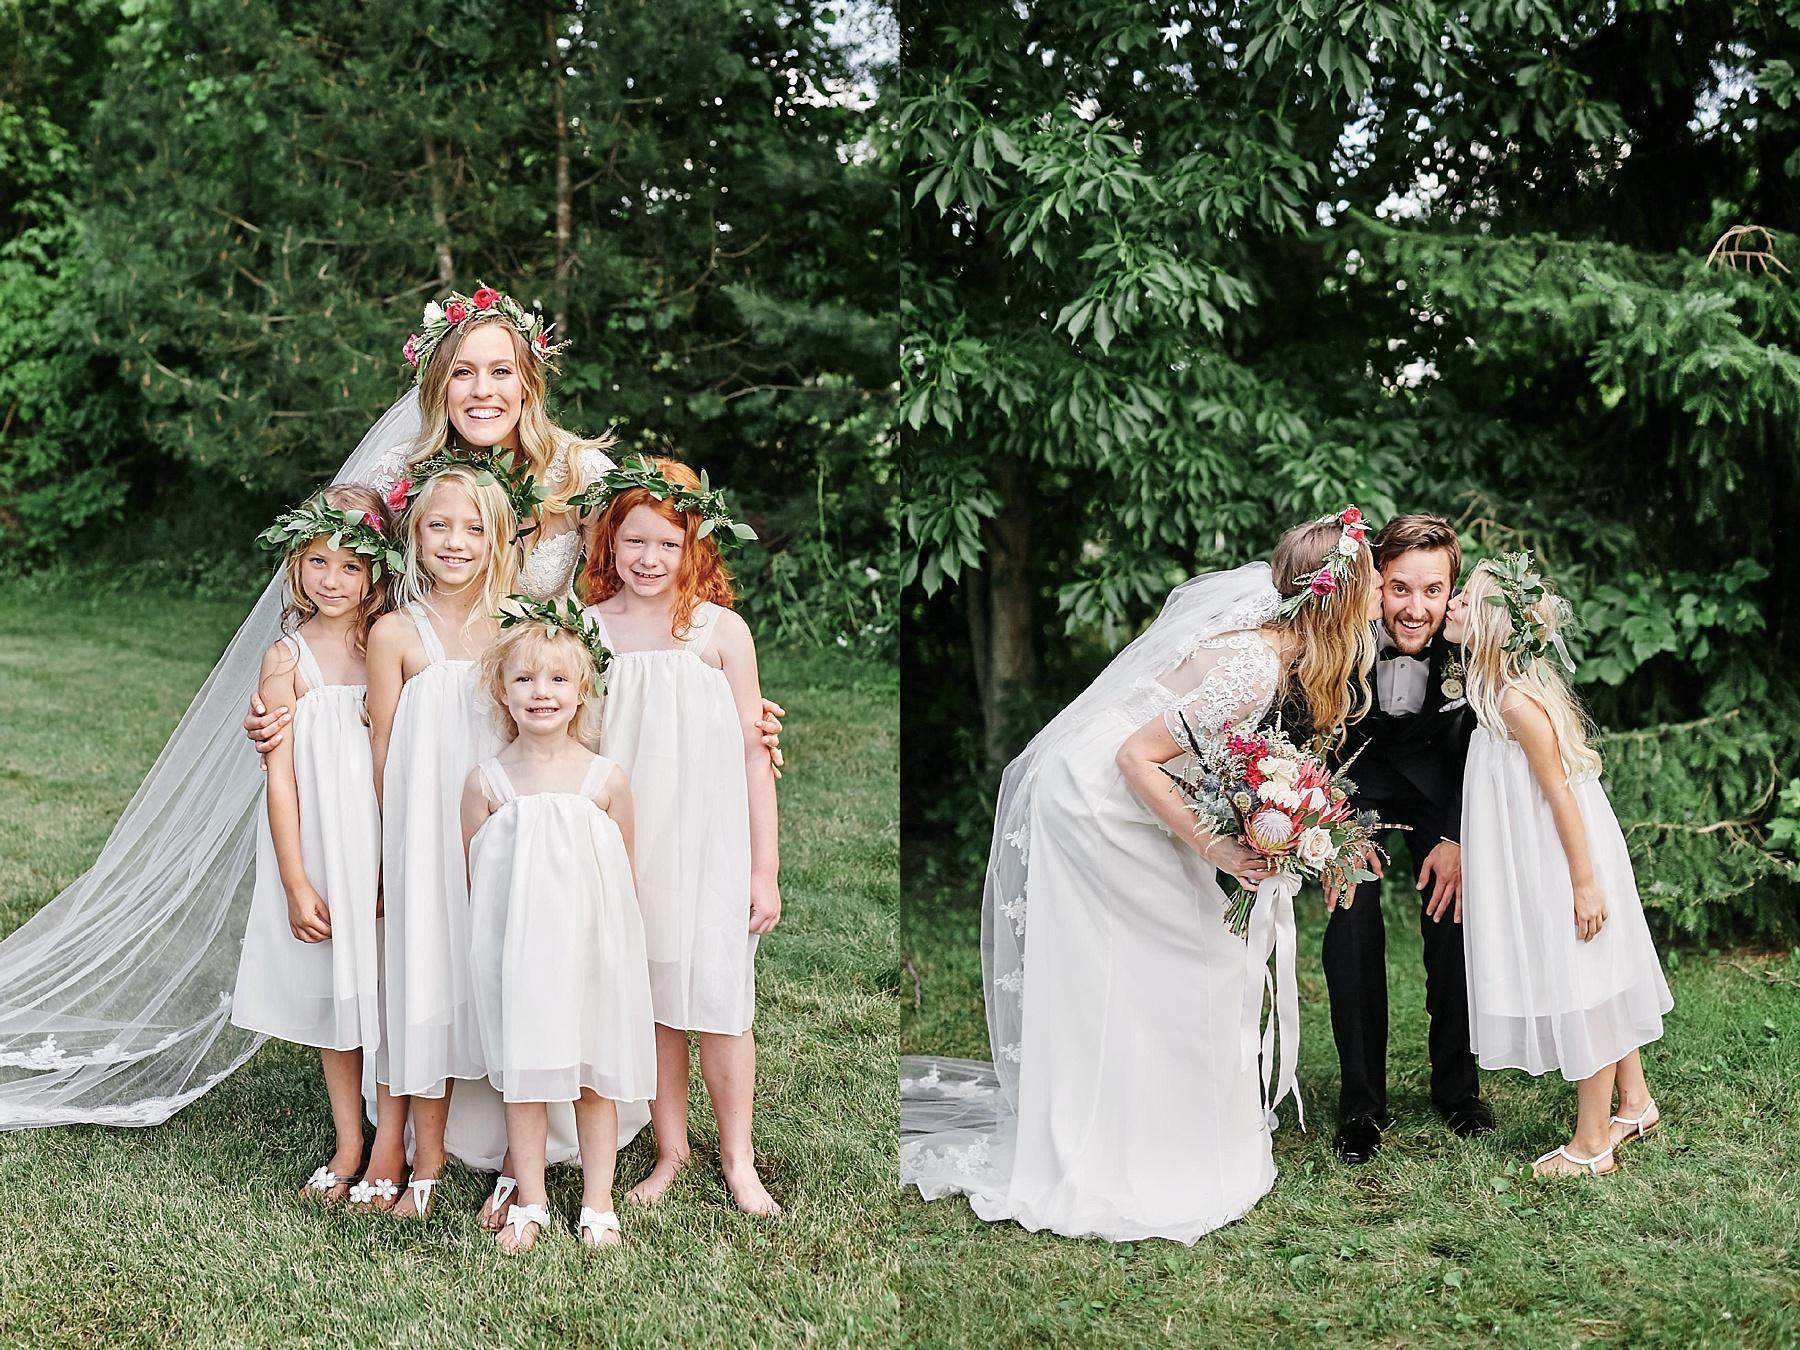 Fairhaven-Farm-South-Haven-Minnesota-Barn-Outdoor-Wedding-Josh-Kailey_0974.jpg